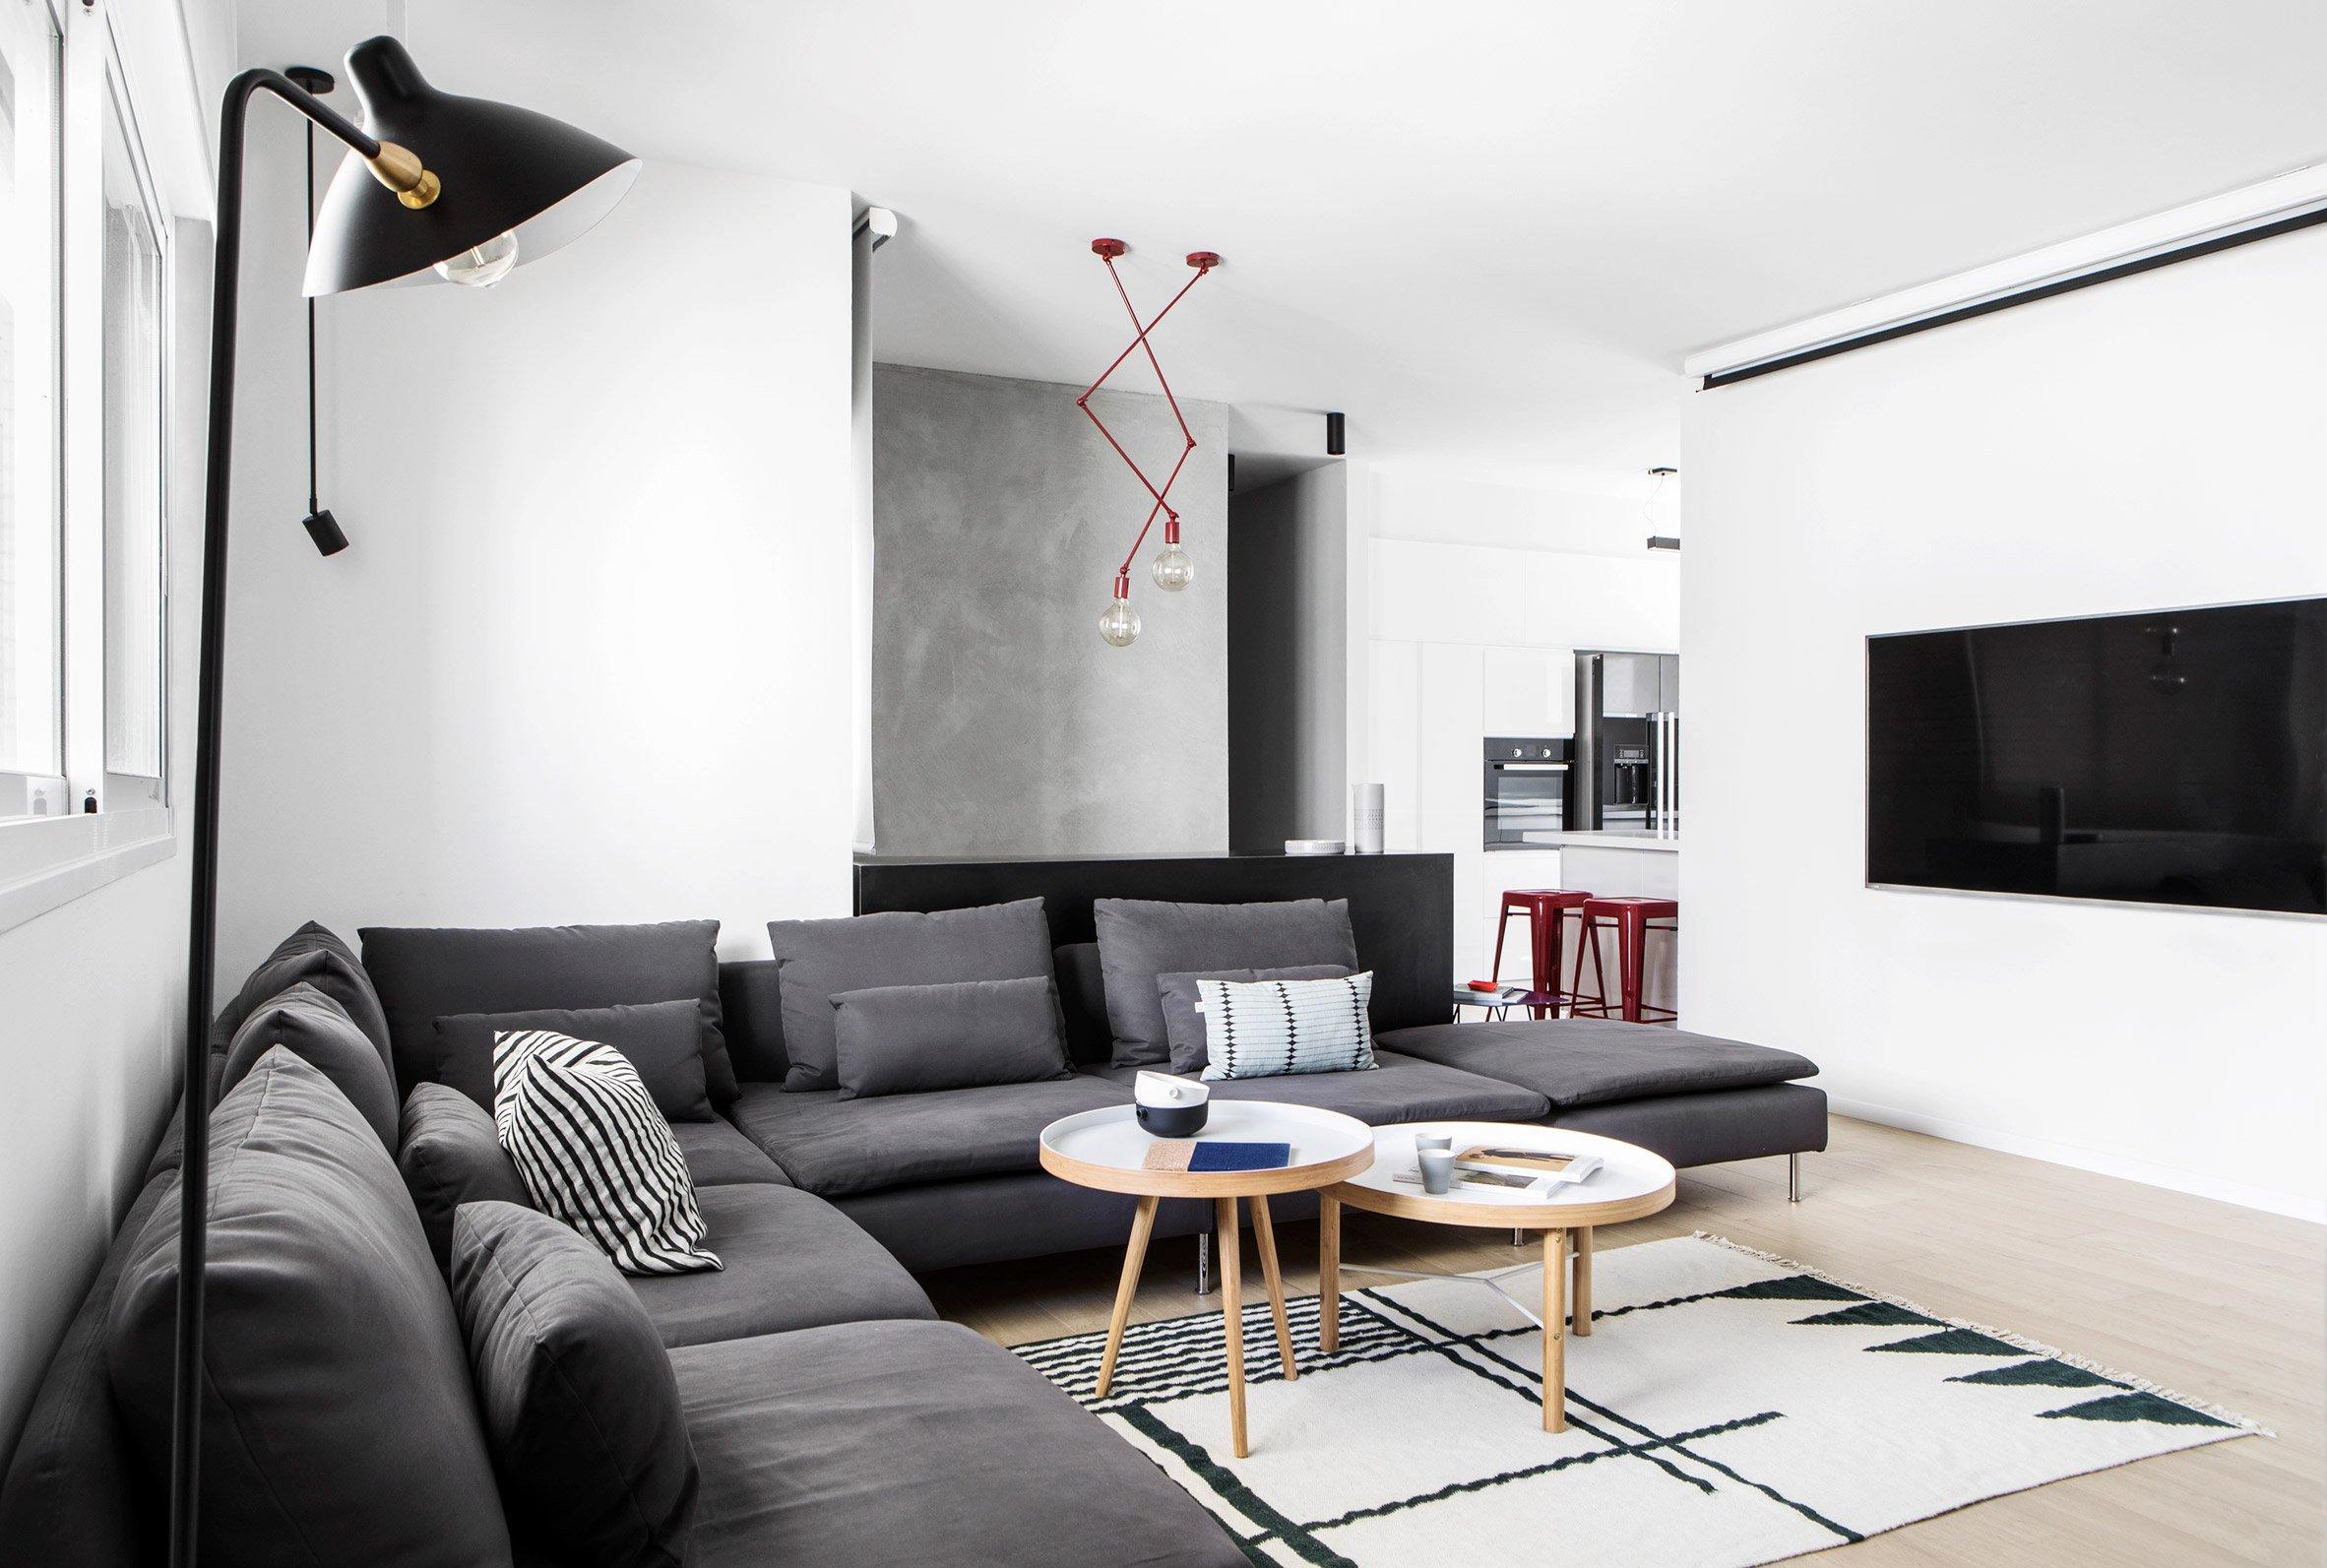 residence-interiors-design-studia-osnovadesign-osnova-poltava_03